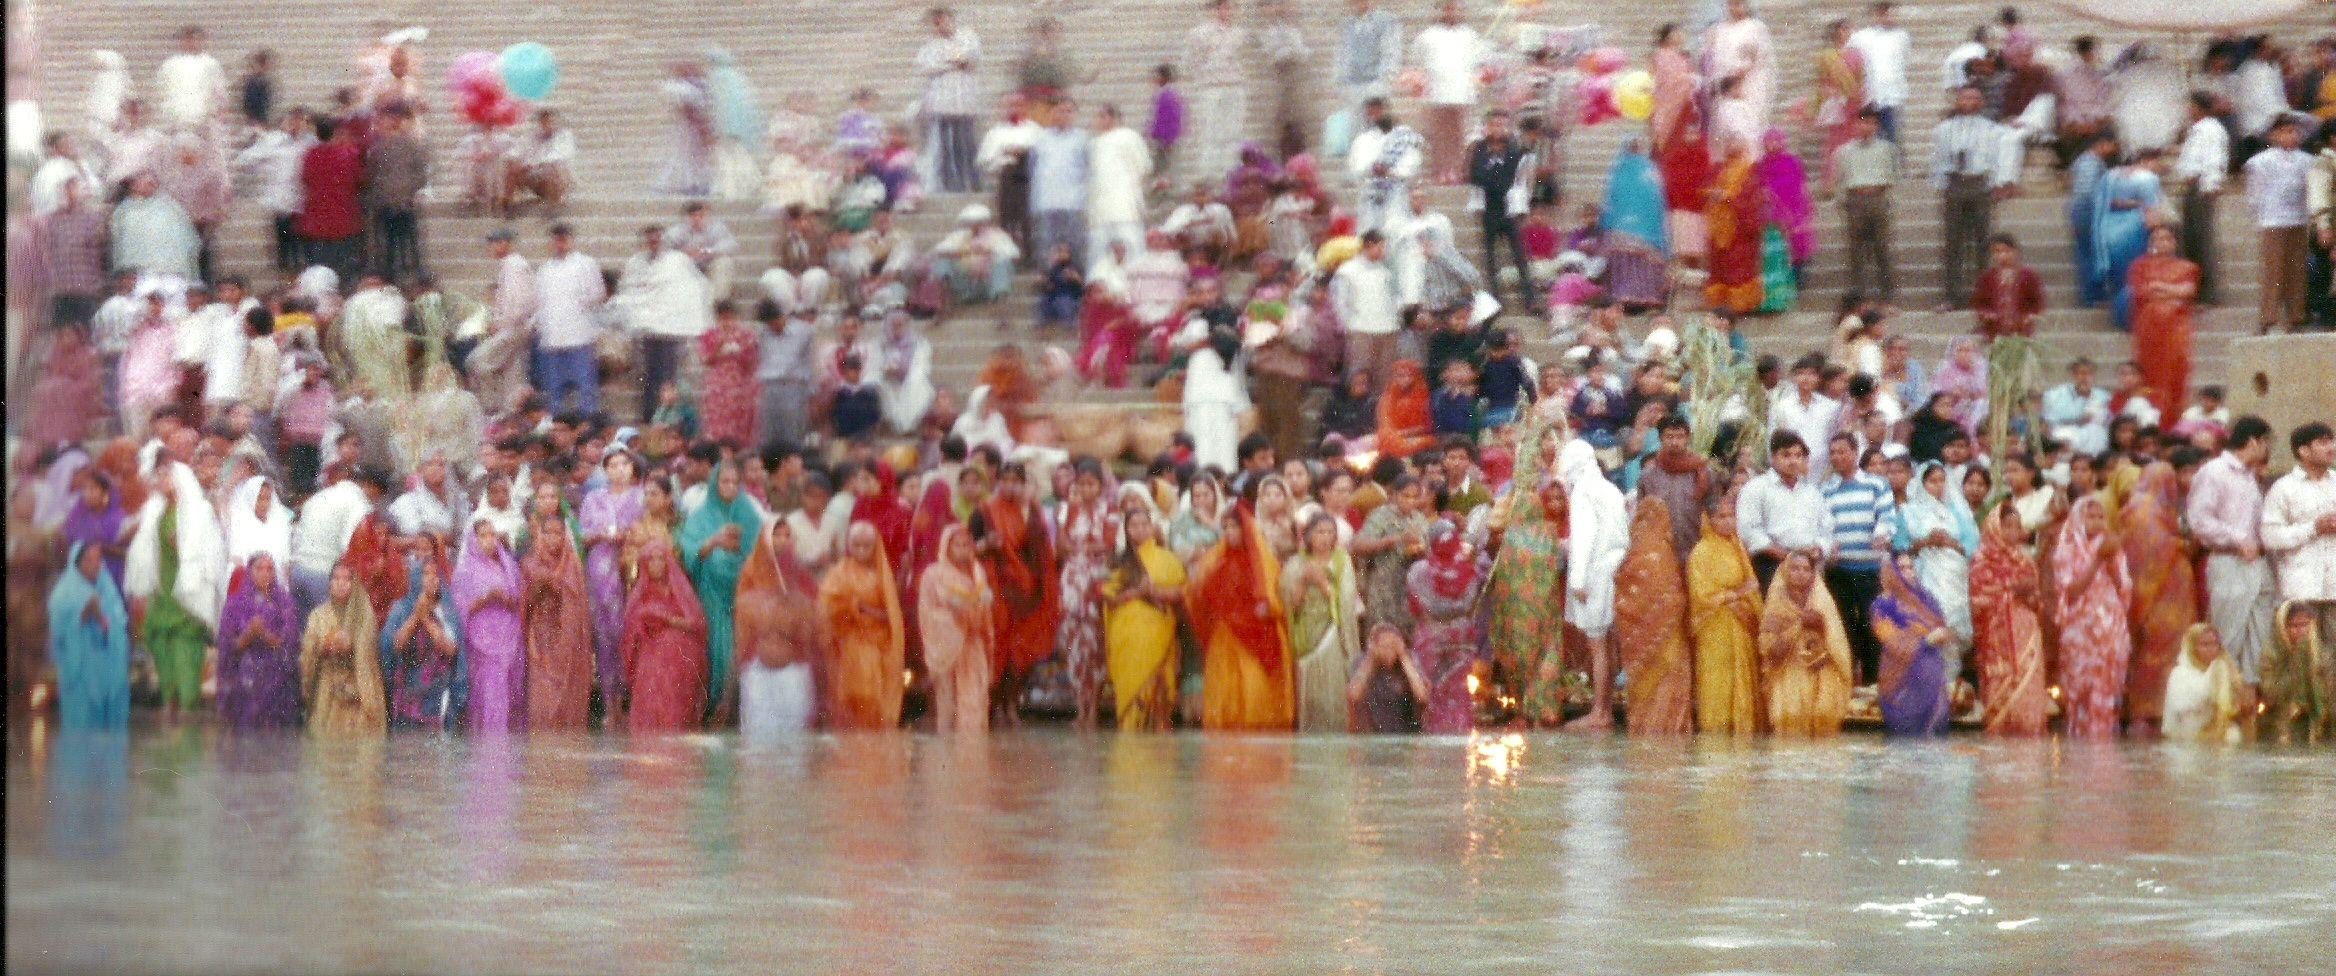 Varanasi, India. The most magical place.